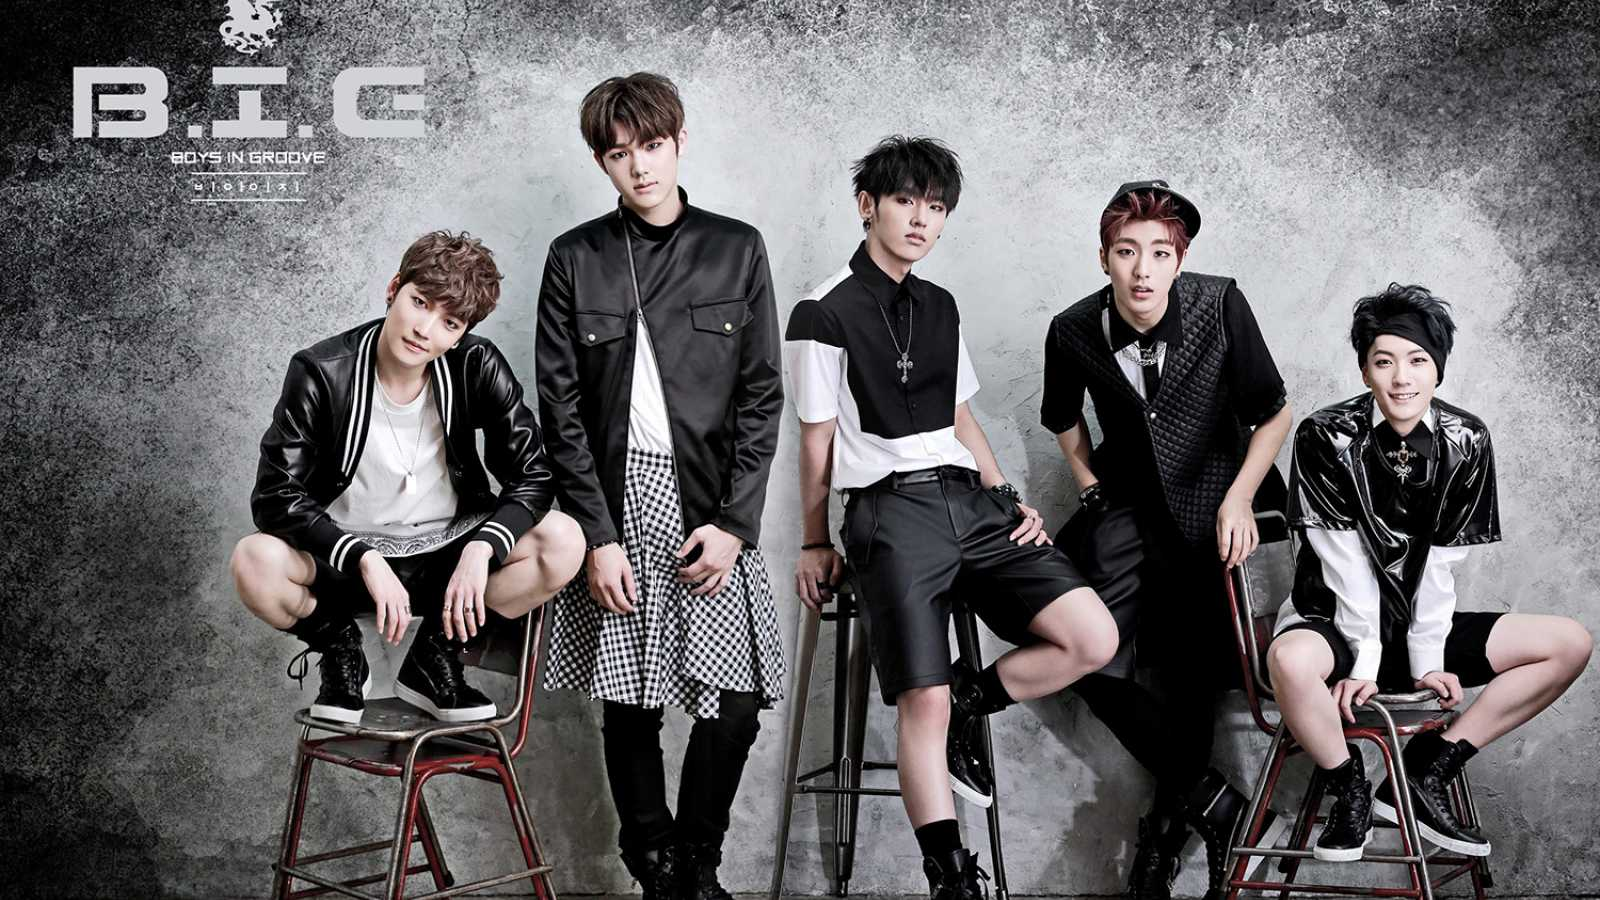 B.I.G © GH Entertainment